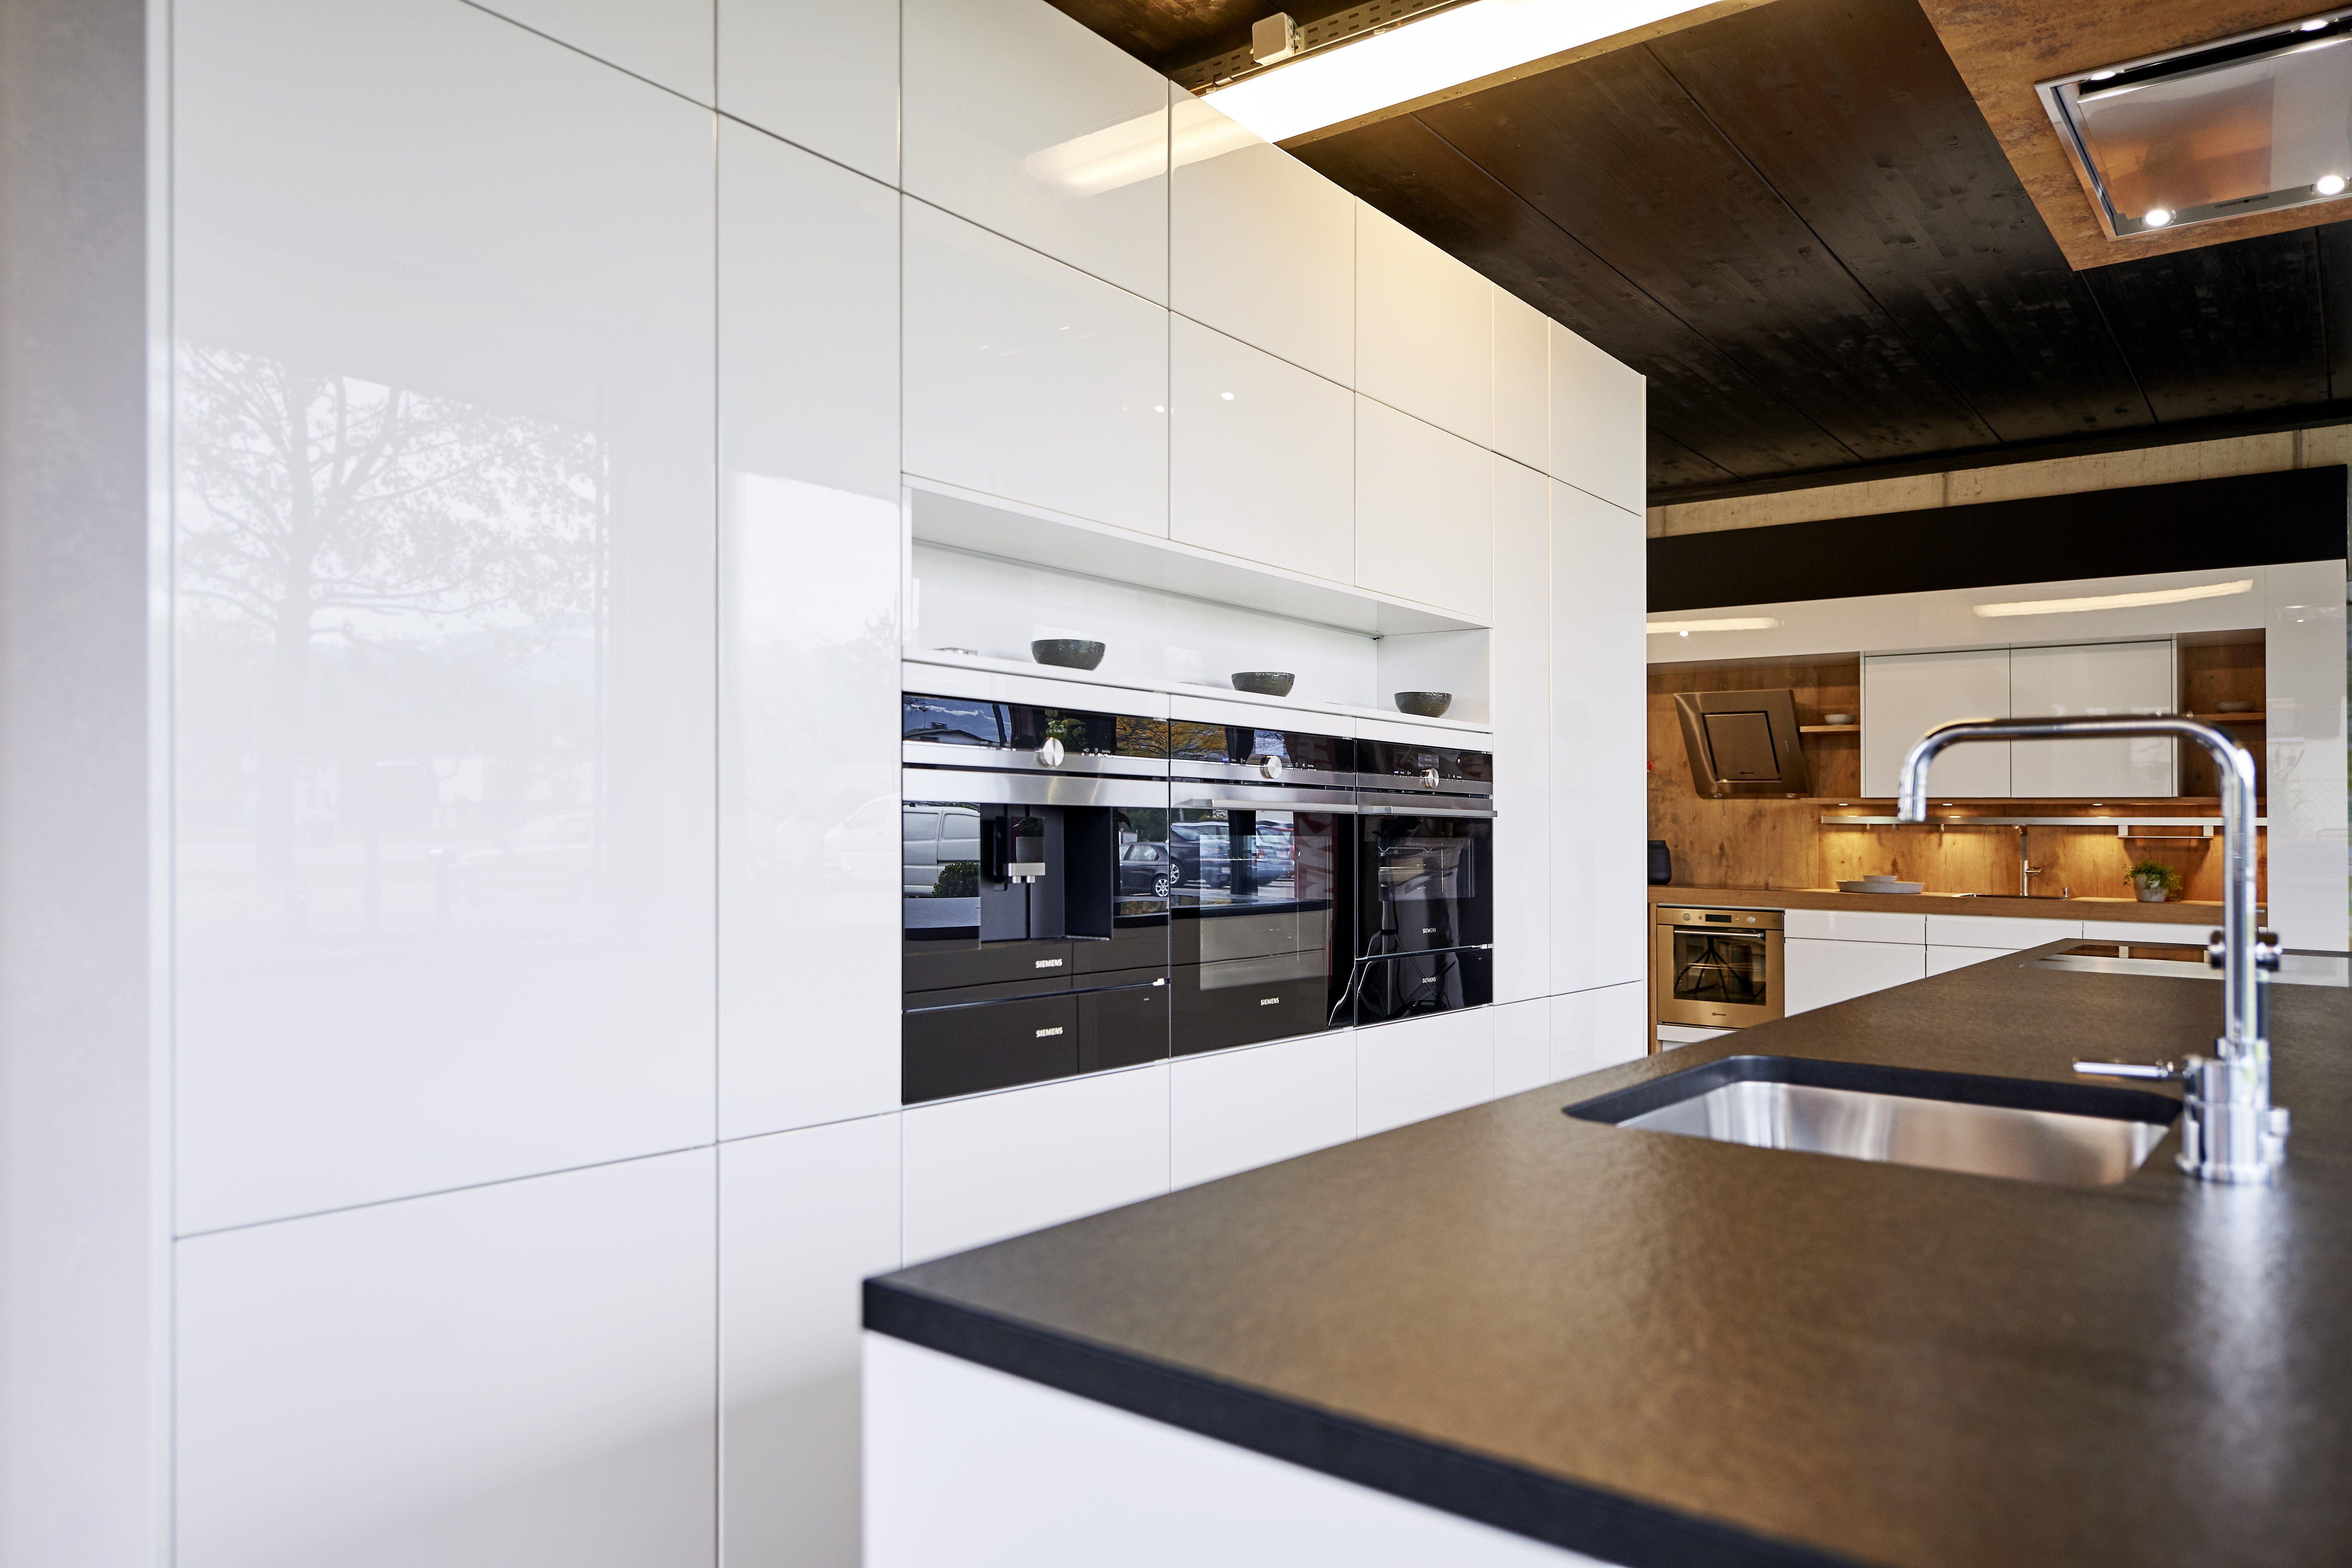 dan k che modern moderne kuche mit insel best dan k chen mit kochinsel alba. Black Bedroom Furniture Sets. Home Design Ideas